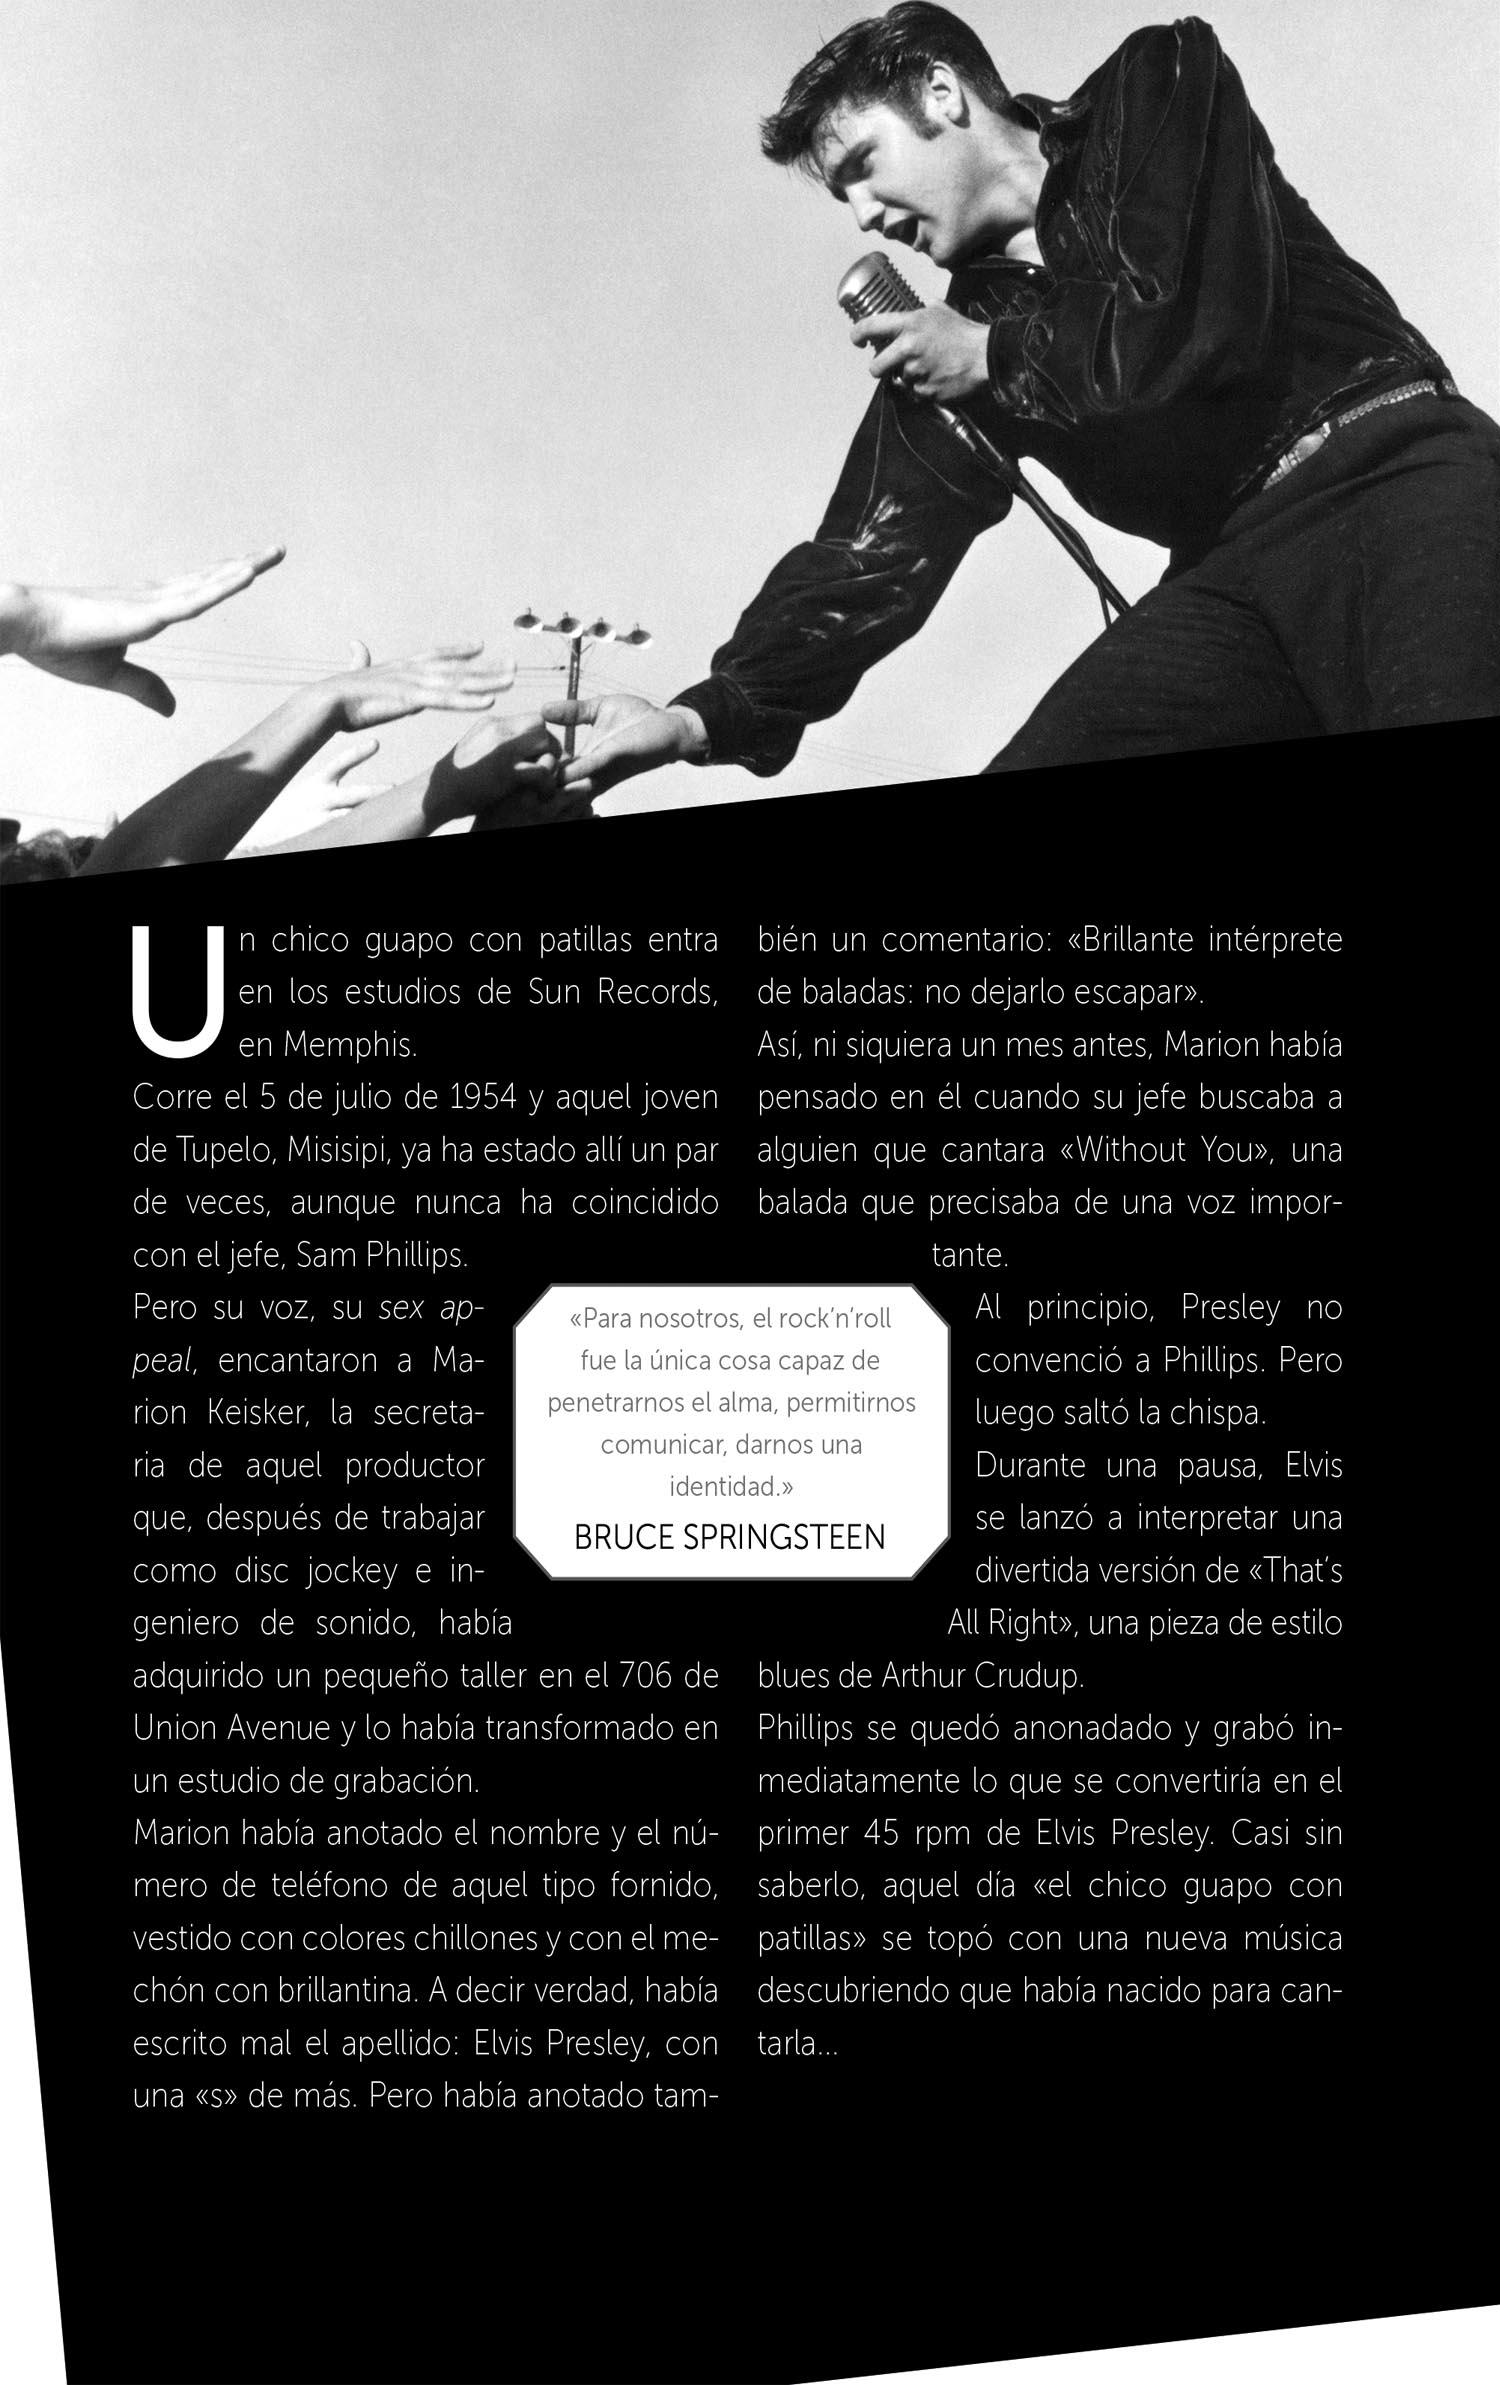 cronica1.jpg